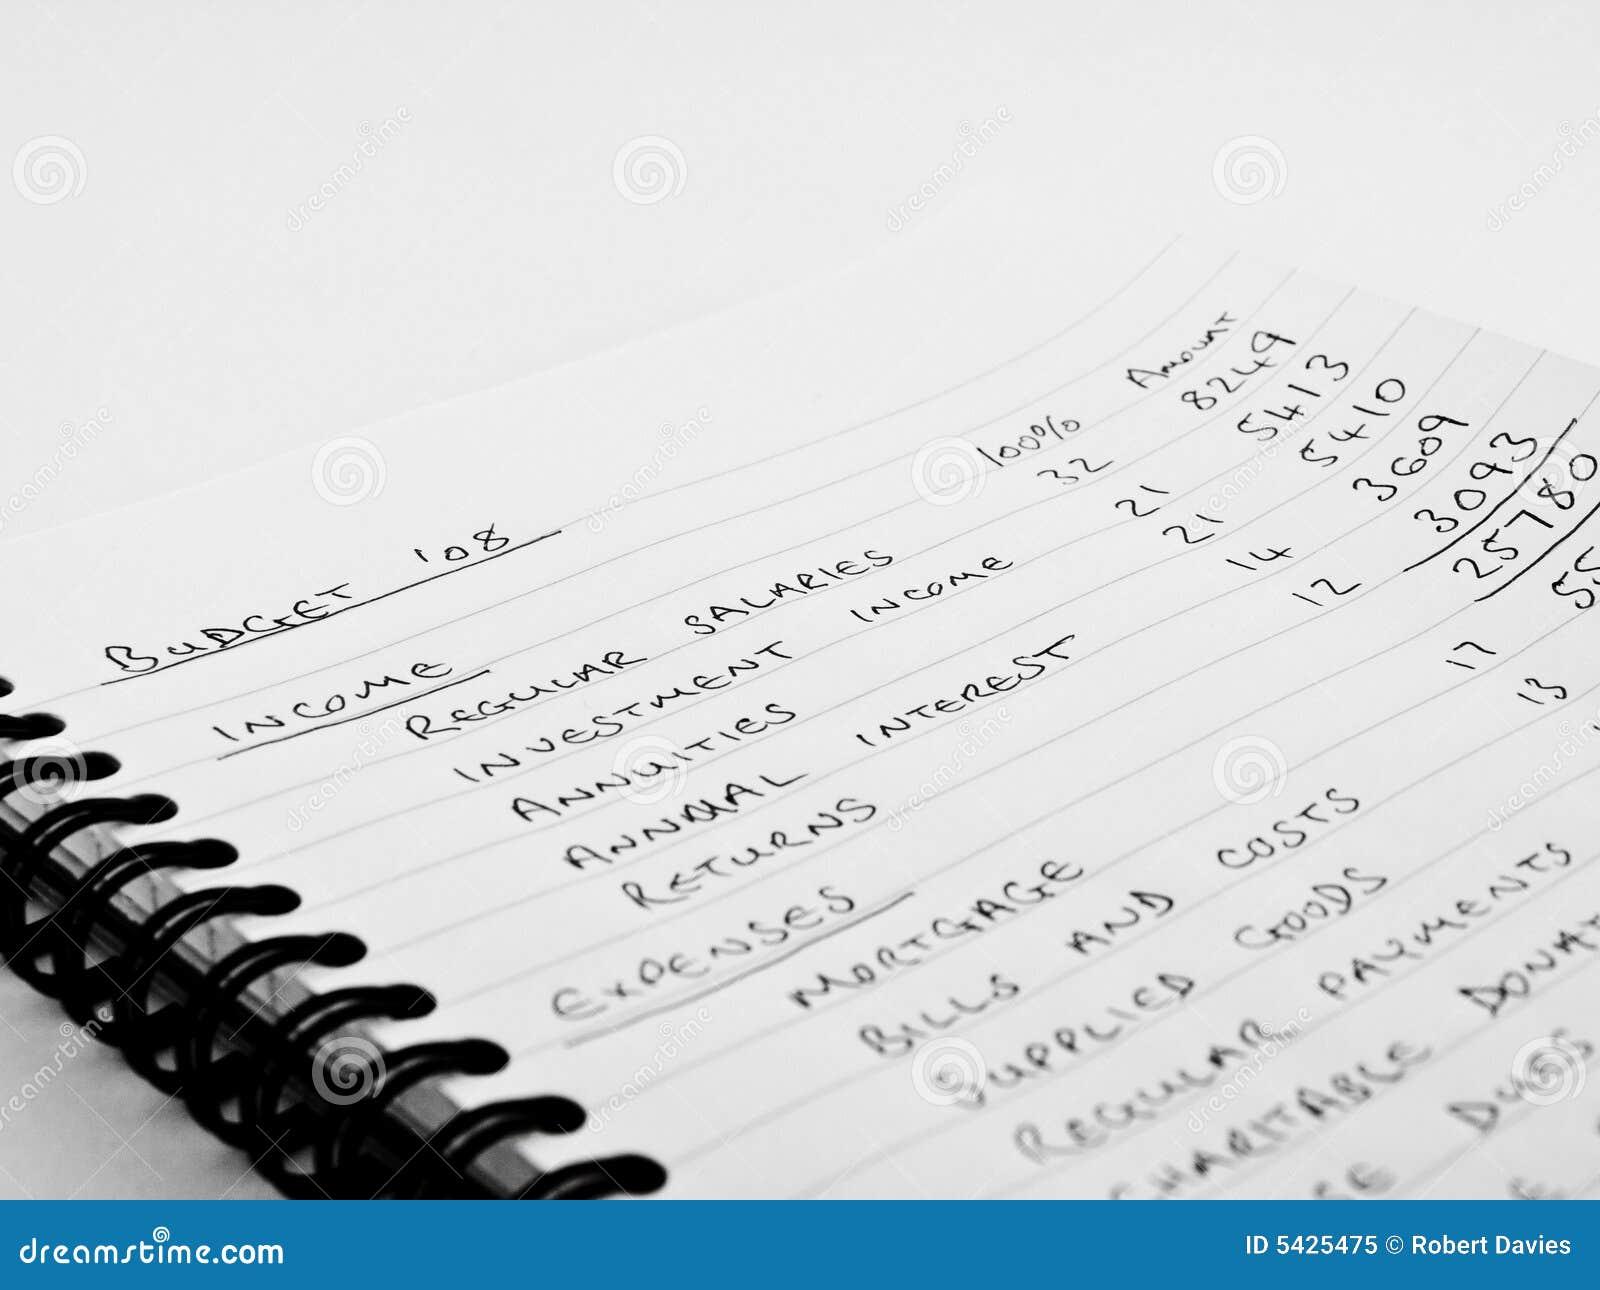 Handwritten Home Budget On Lined Notebook Paper Stock Image Handwritten  Home Budget Lined Notebook Paper 5425475  Notebook Paper Download